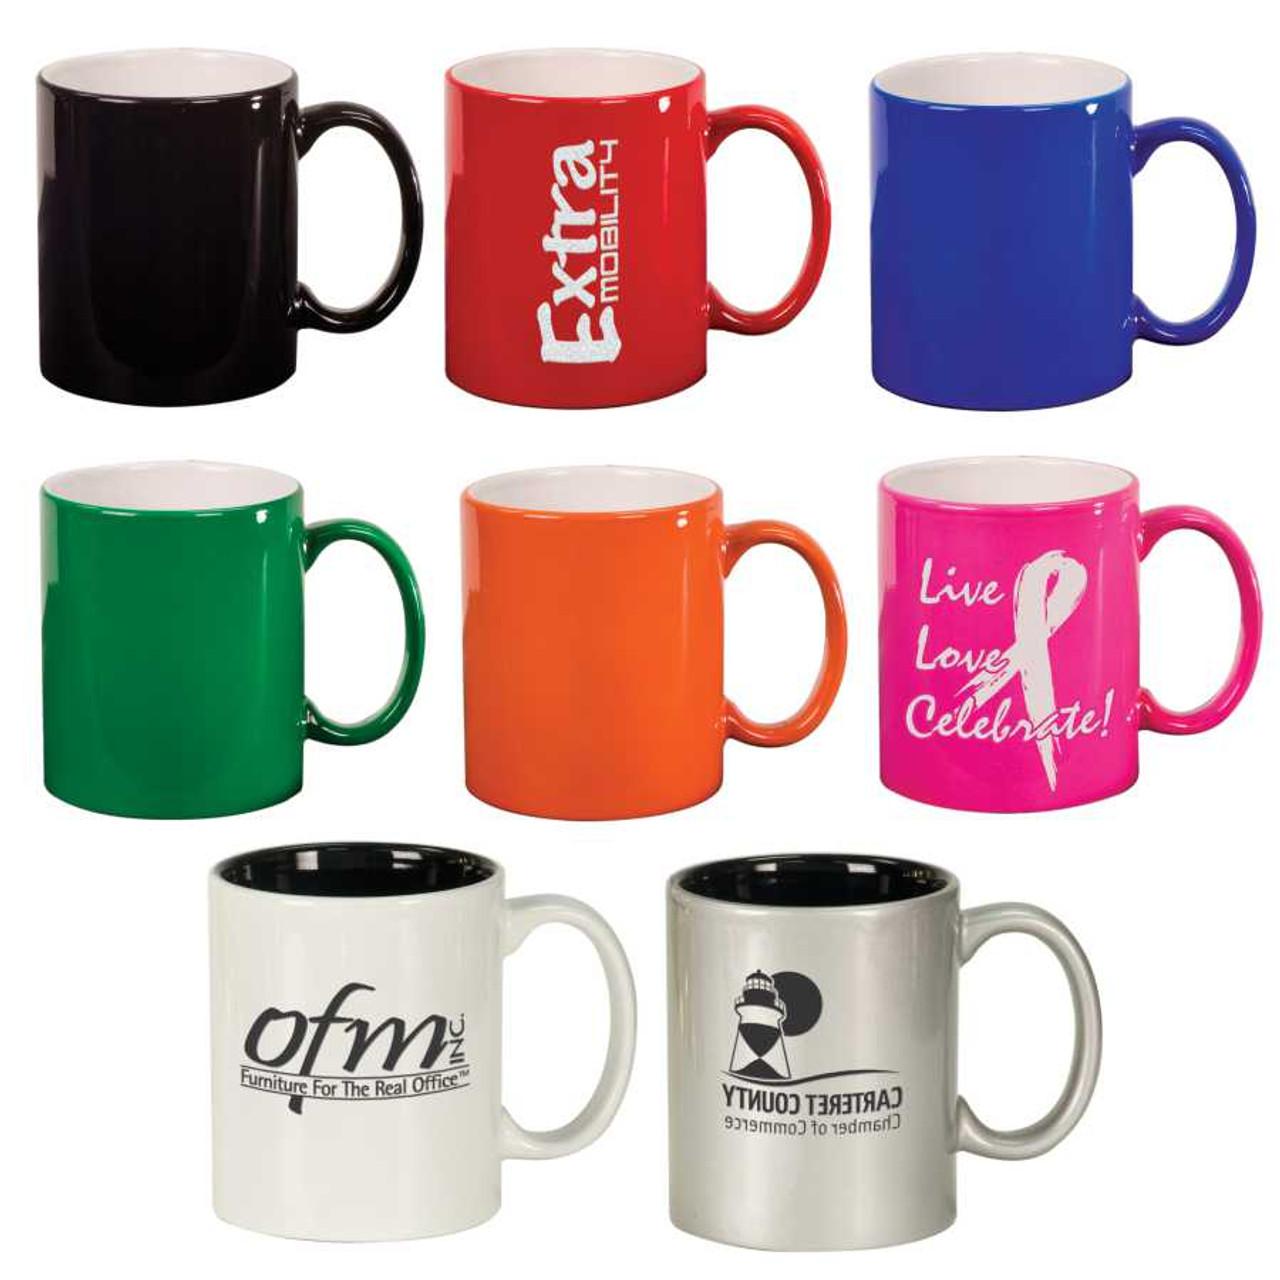 4b3201a5978 I Before E laser engraved coffee mug. A · Coffee Mug Colors